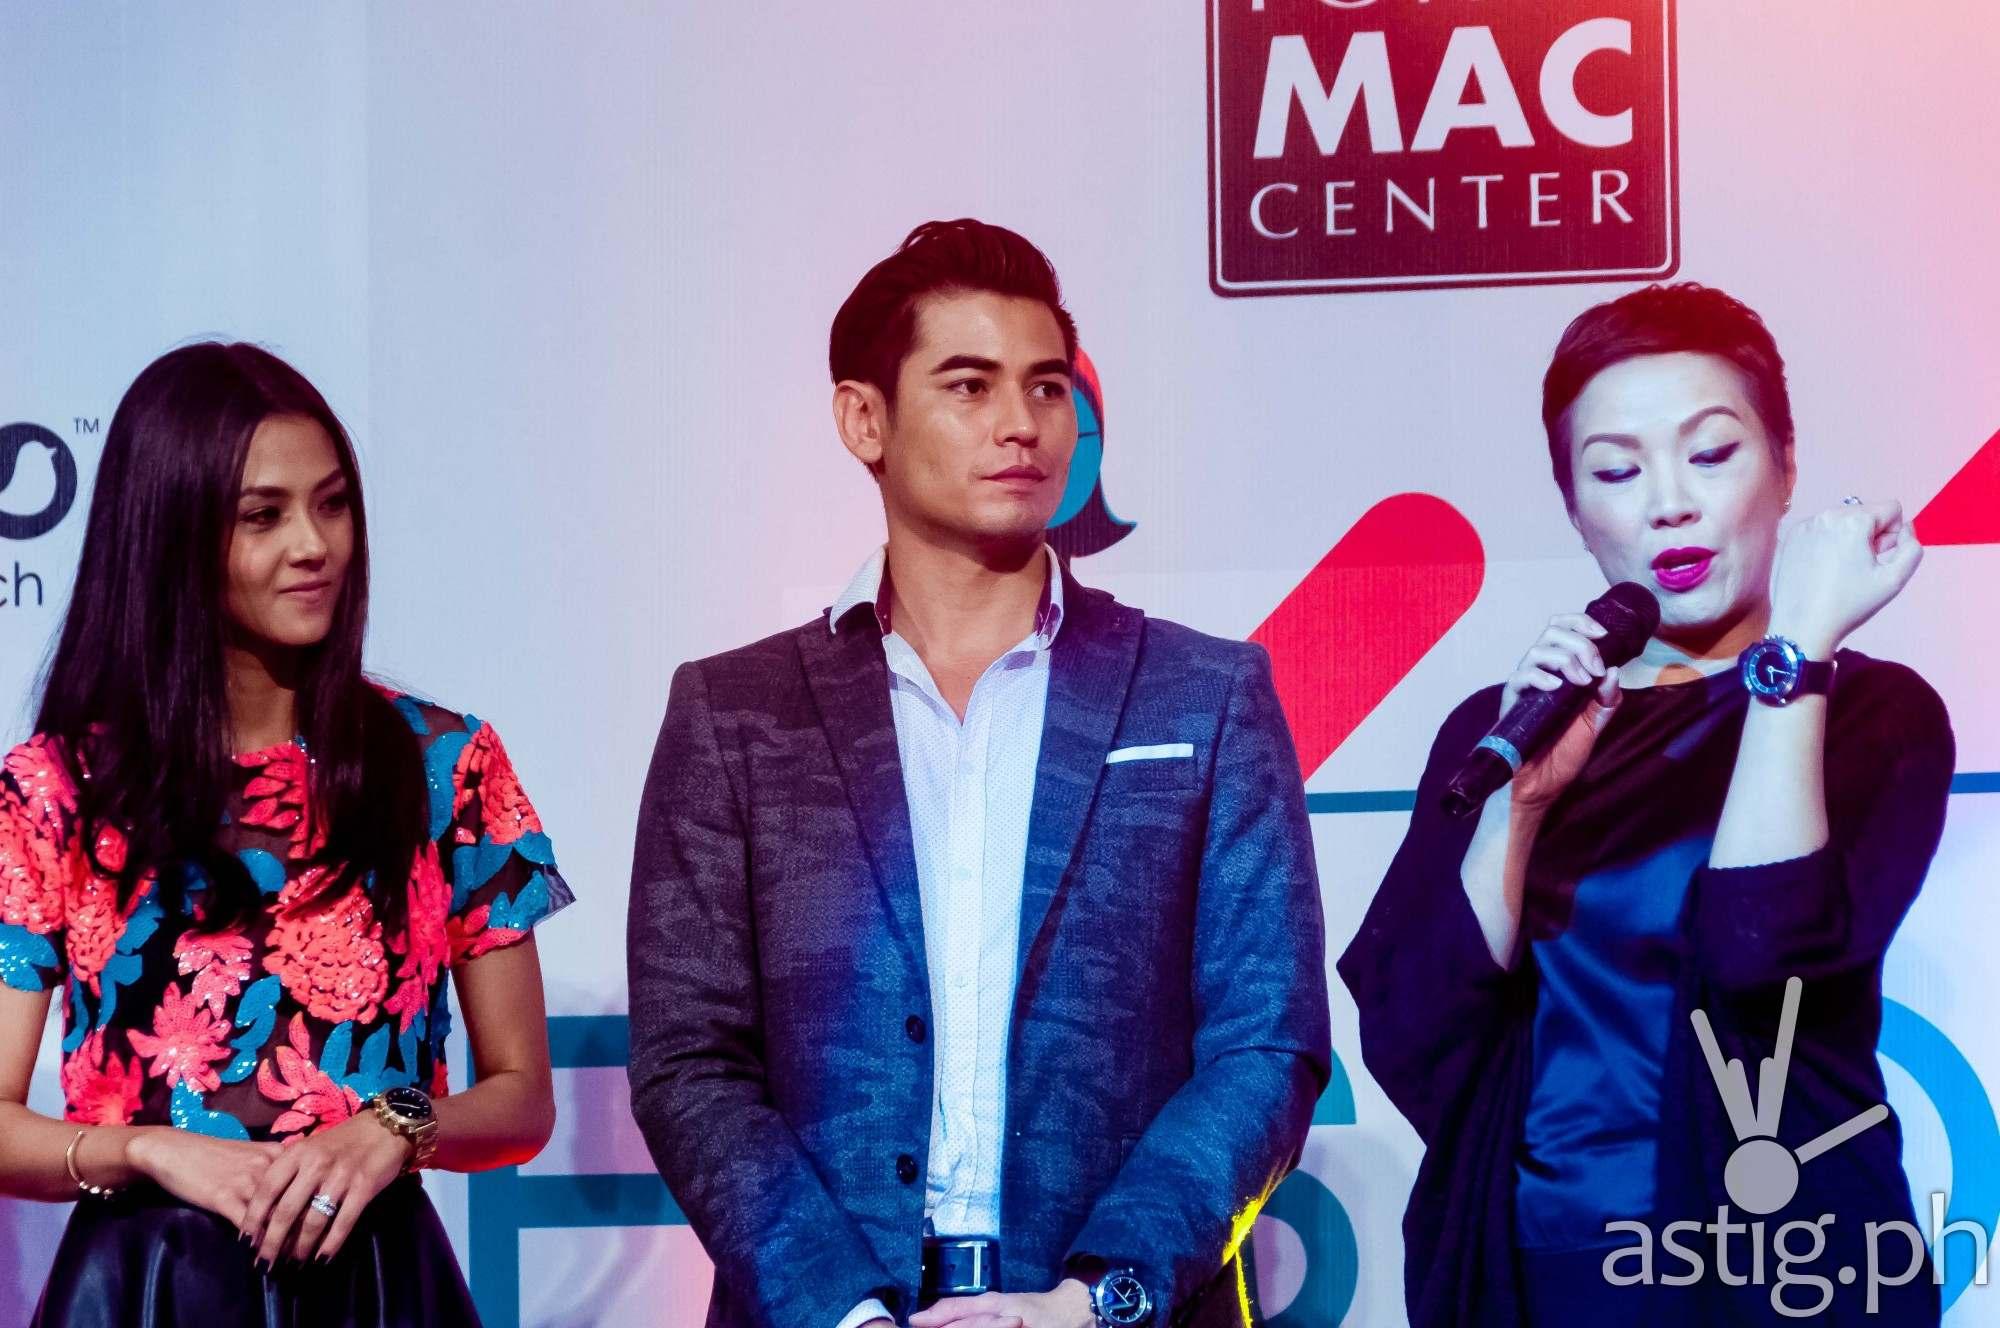 Vanessa Matsunaga and Fabio Ide at the FUSION tech + fashion event by Power Mac Center